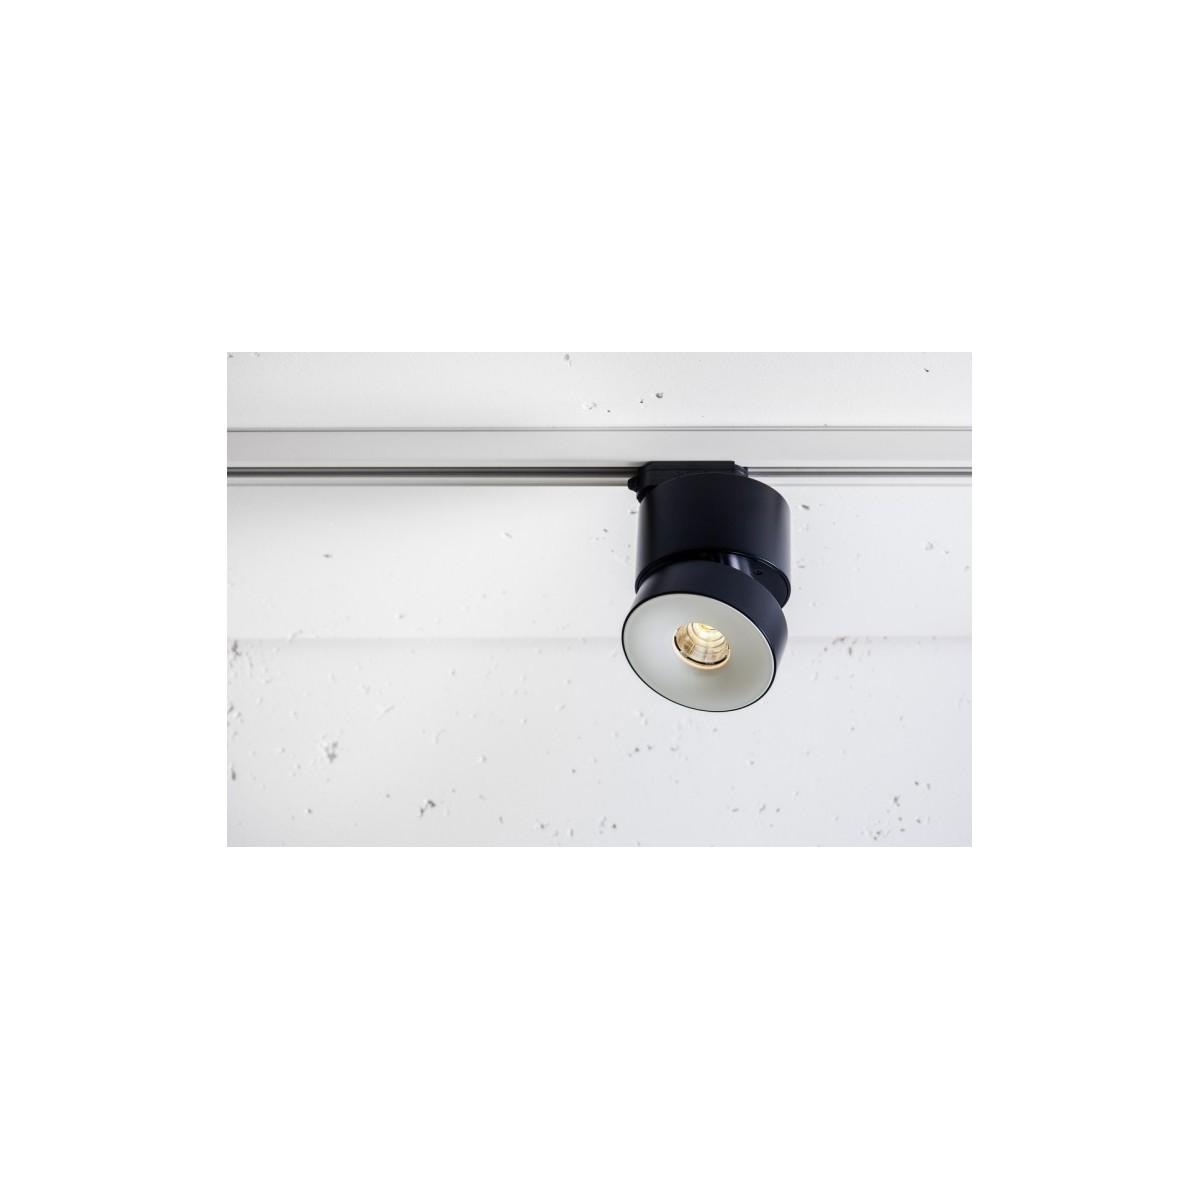 Labra GEIT edge.LED 7.5W Adaptor 3F 7-0699